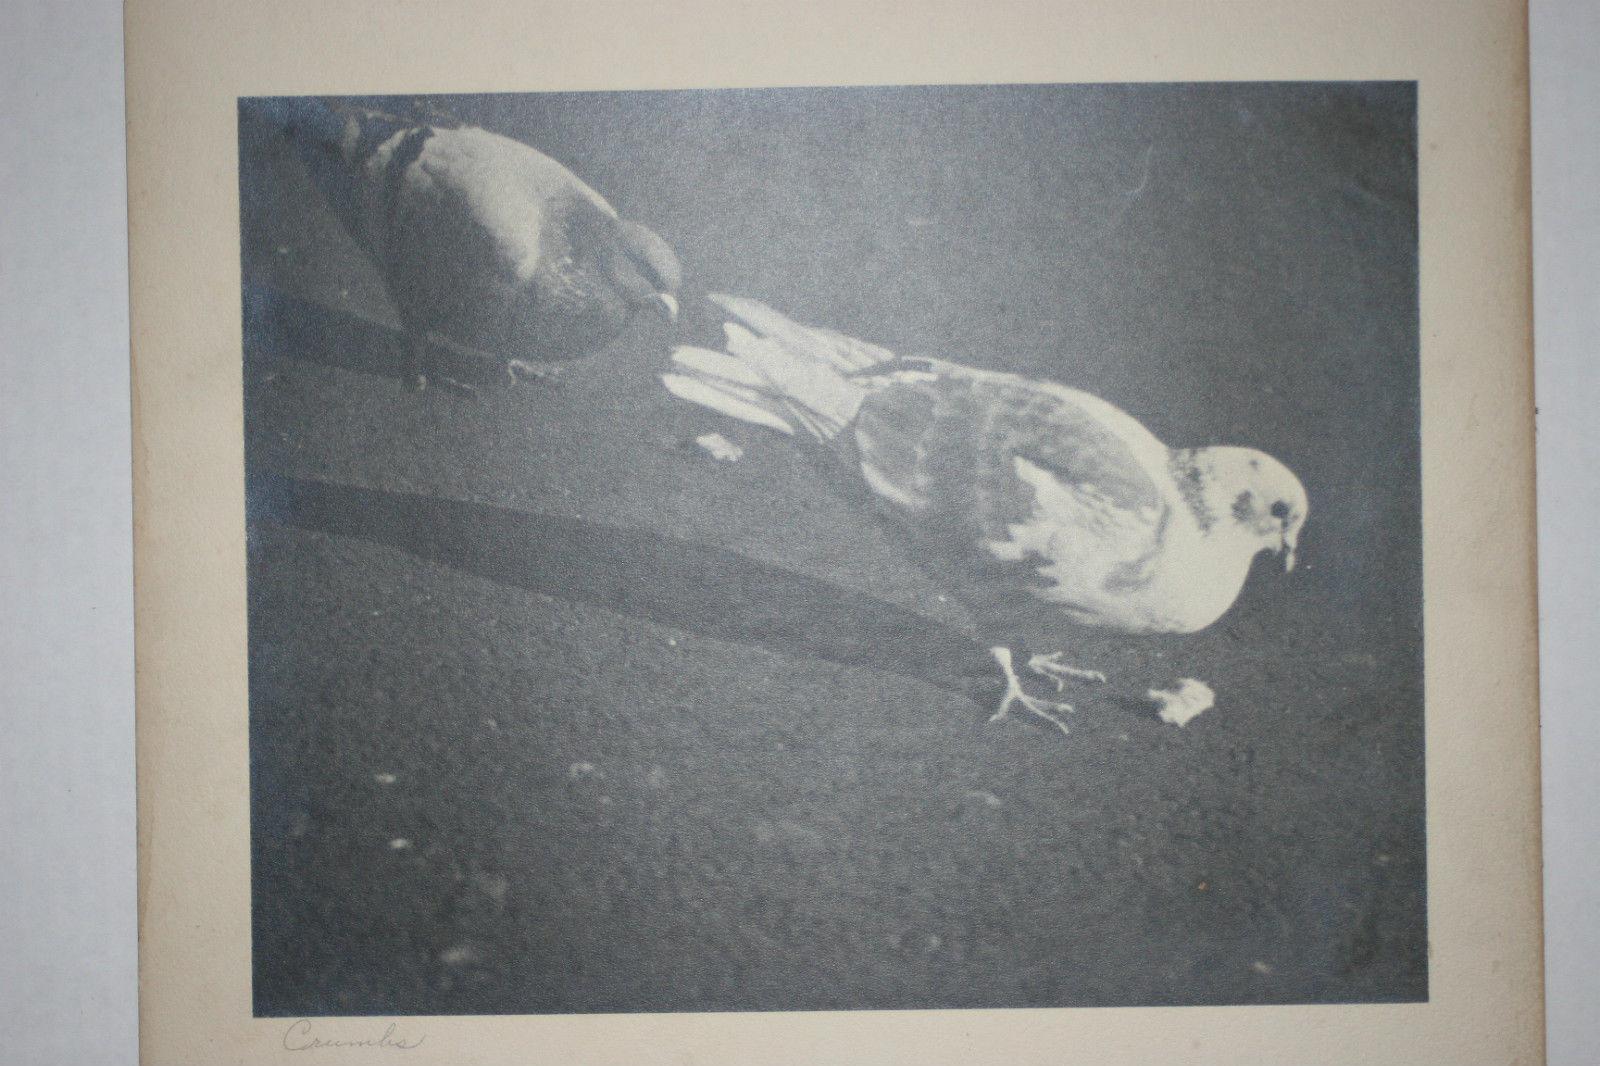 VINTAGE BLACK & WHITE SILVER GELATIN PHOTOGRAPH ~ TITLED CRUMBS ~  PIGEON BIRD image 2